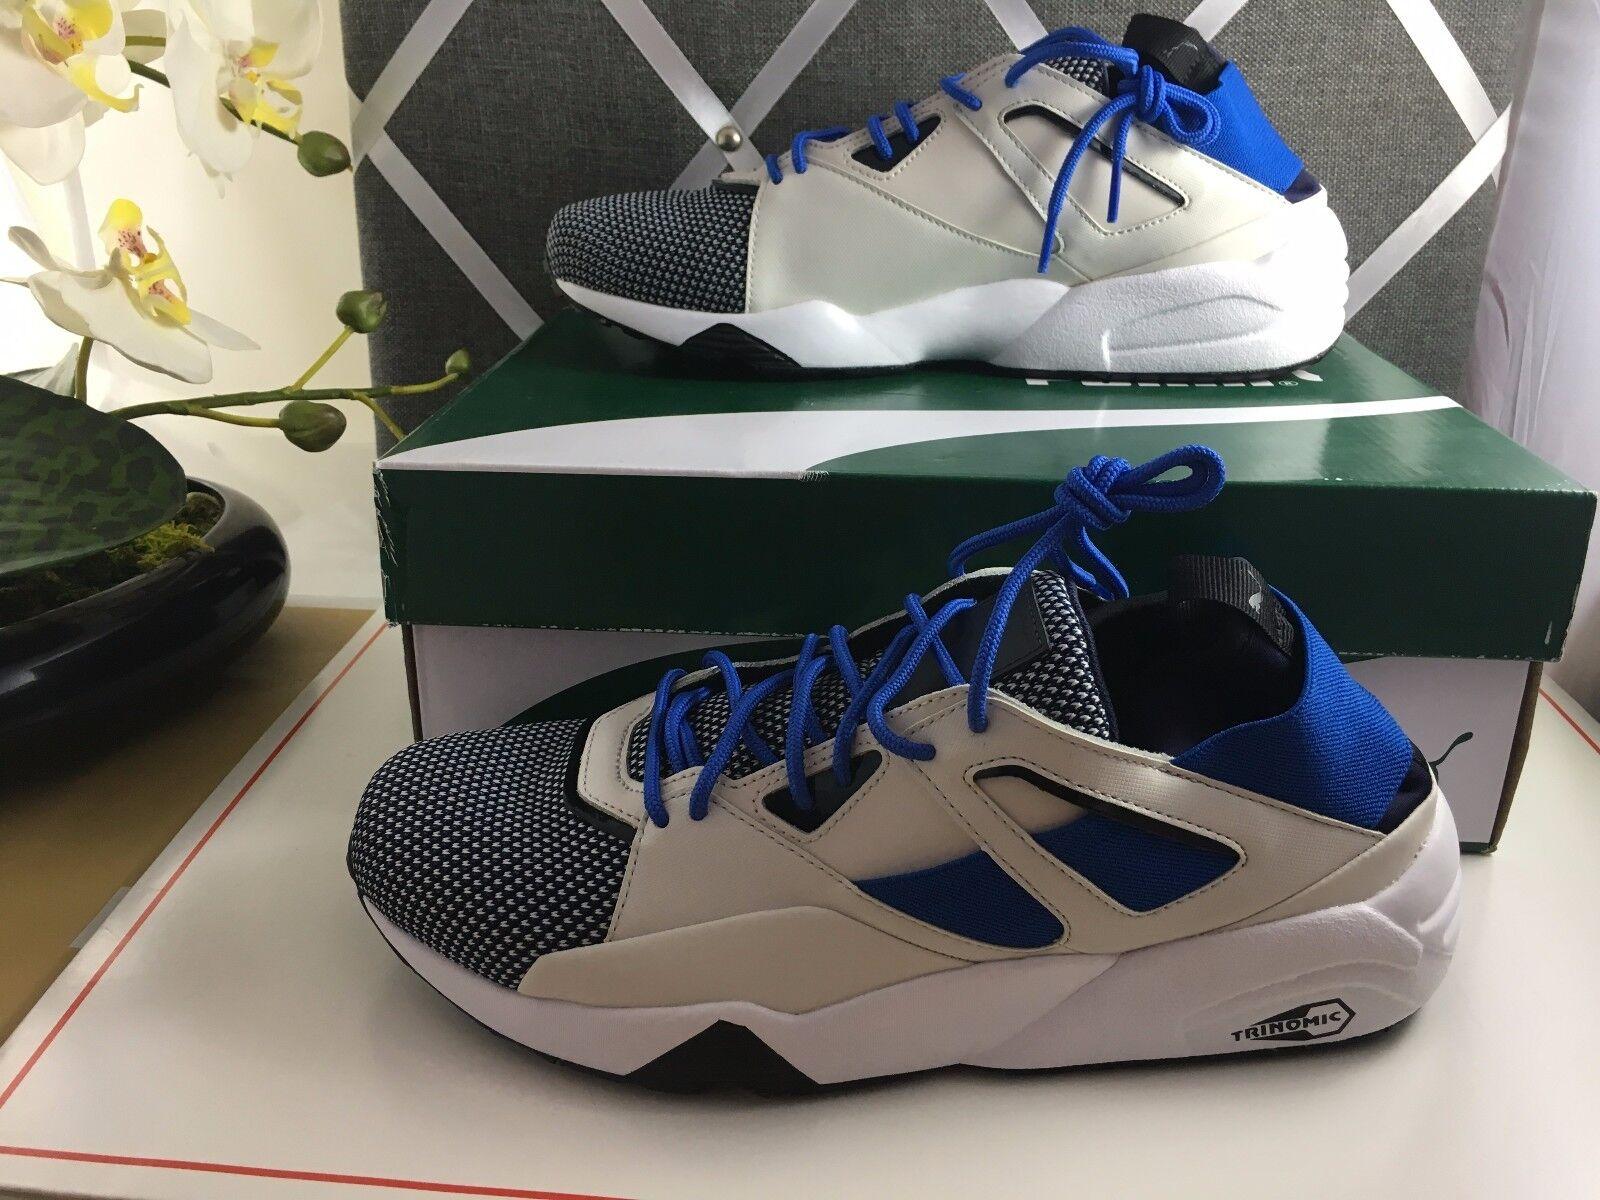 New PUMA BOG Sock Tech  Men's Shoes Sneakers 362037 03 Choose SIZE  Peacoat Gray